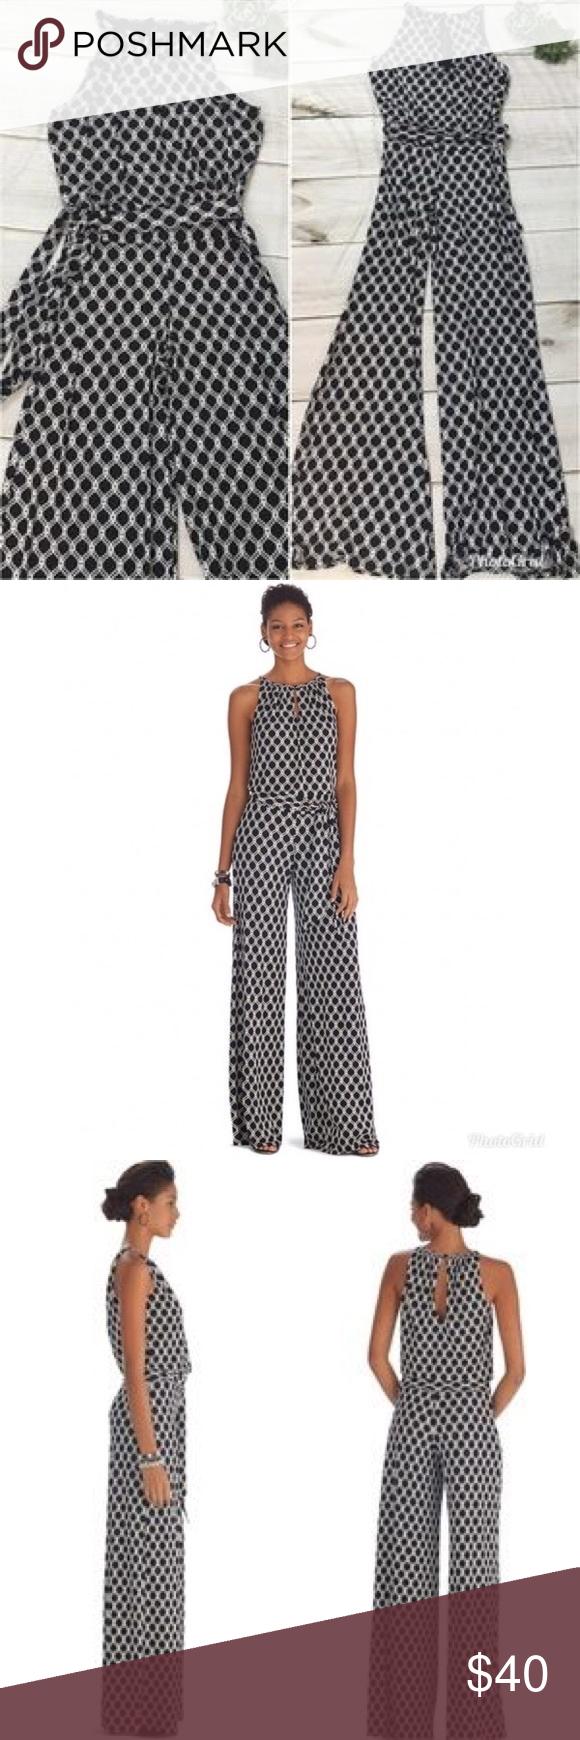 449b34712c1b White House Black Market Jumpsuit size M Beautiful and comfortable. Chic  matte jersey jumpsuit. White House Black Market Pants Jumpsuits   Rompers